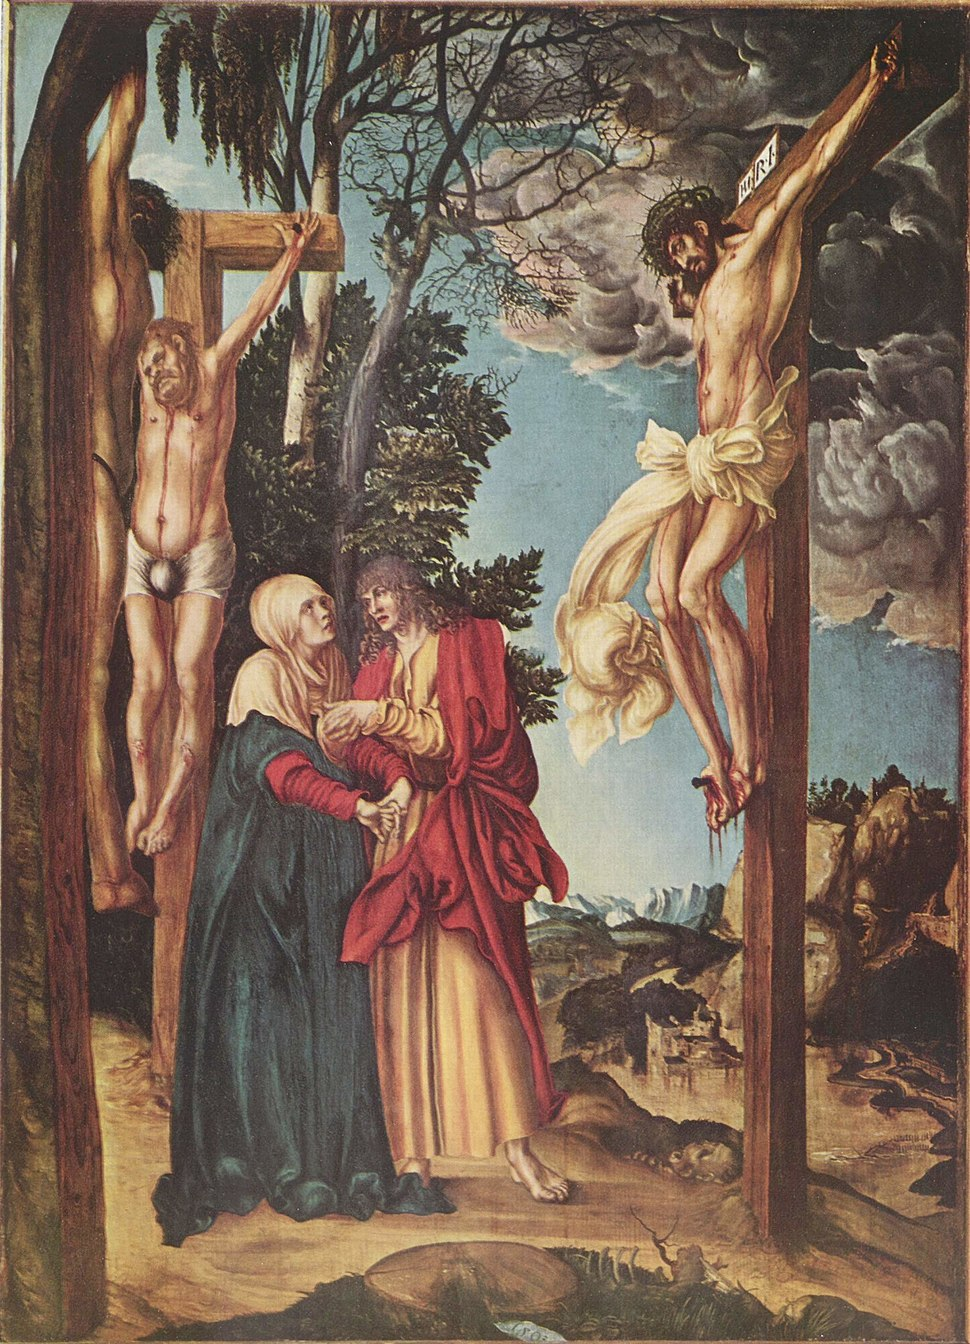 Lucas Cranach d. Ä. - The Lamentation of Christ - The Schleißheim Crucifixion - Alte Pinakothek